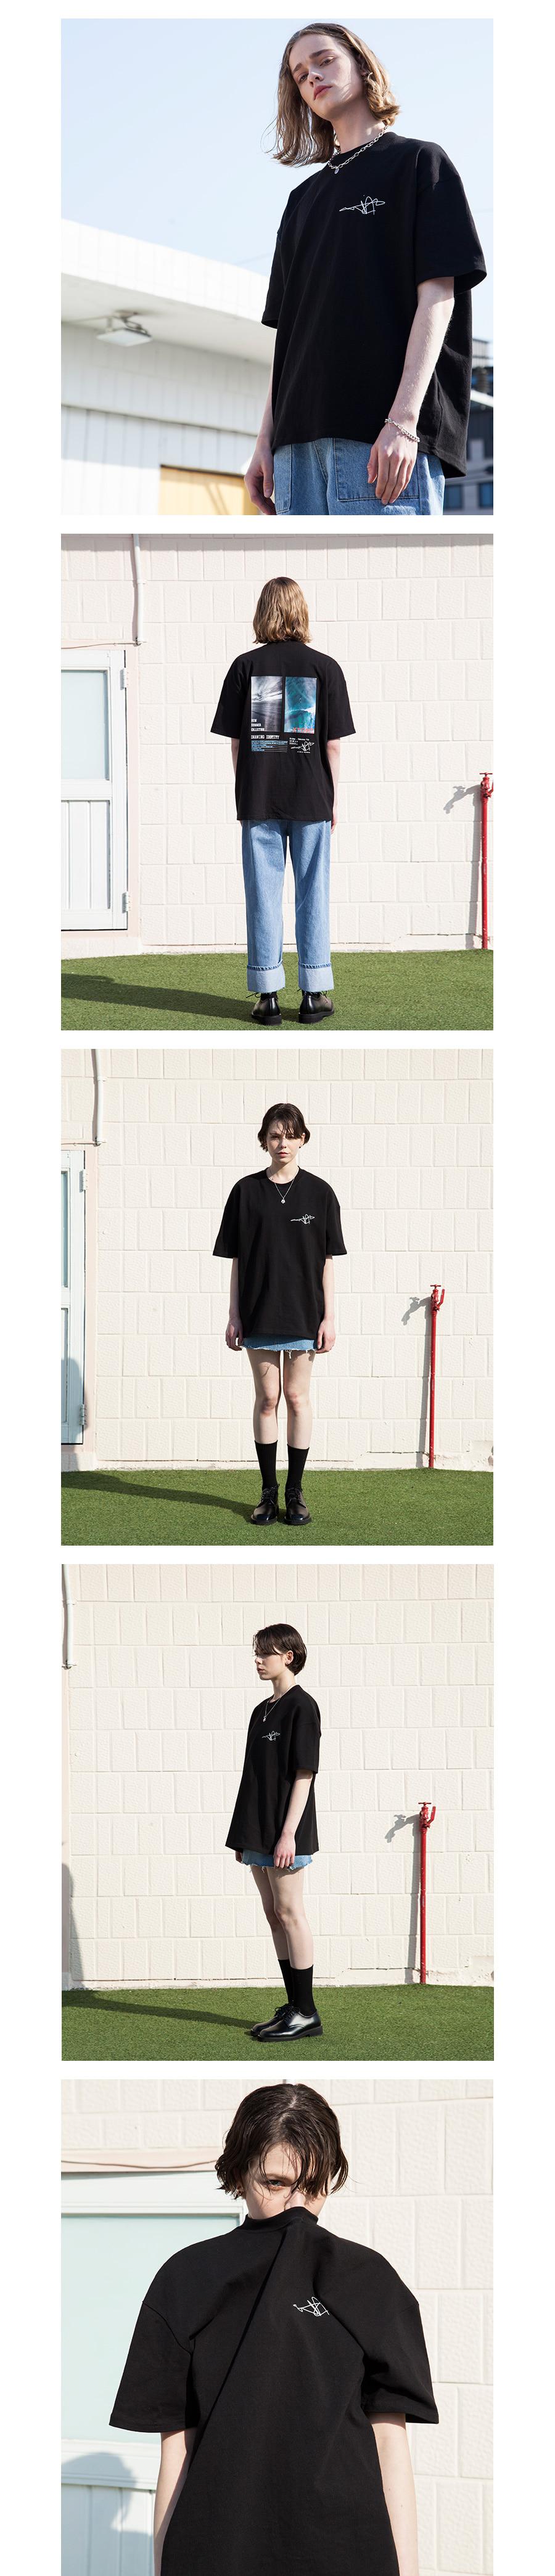 XTT020 레트로 썸머 반팔 티셔츠 (BLACK)